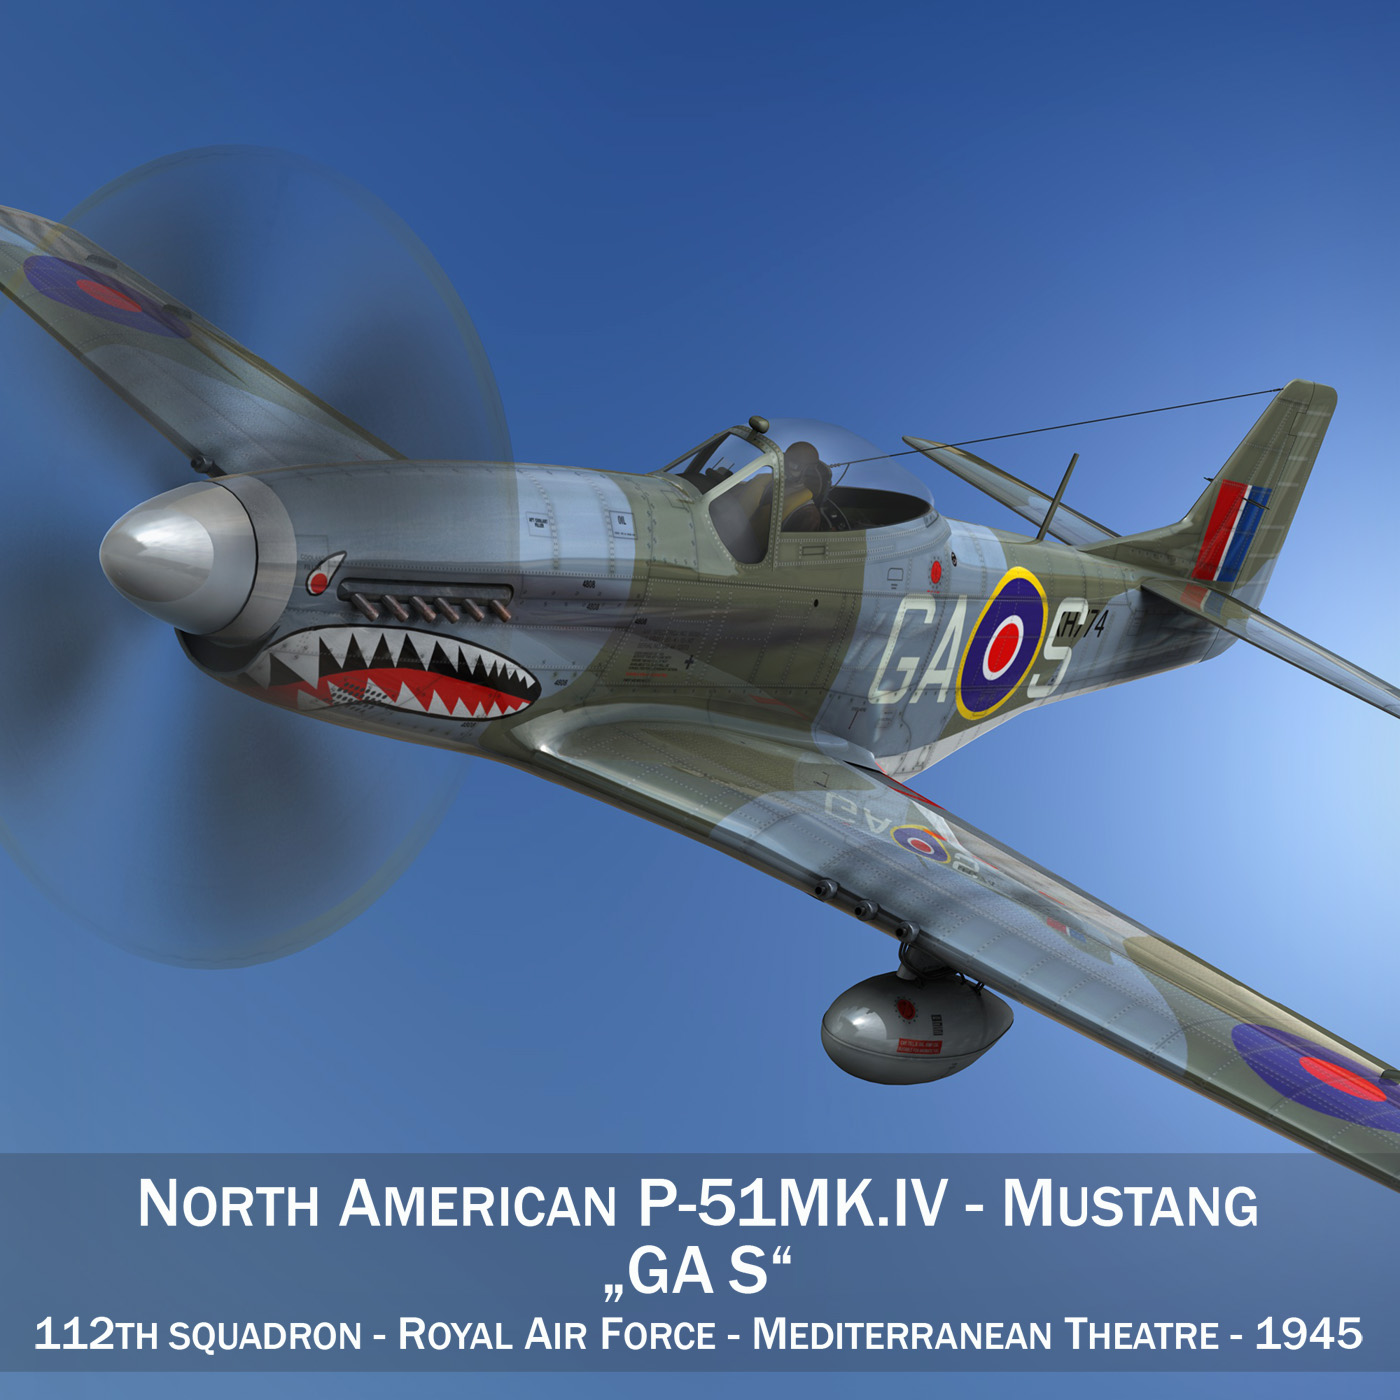 North American P-51K Mustang MK.IV - RAF 3d model fbx c4d lwo lws lw obj 280336